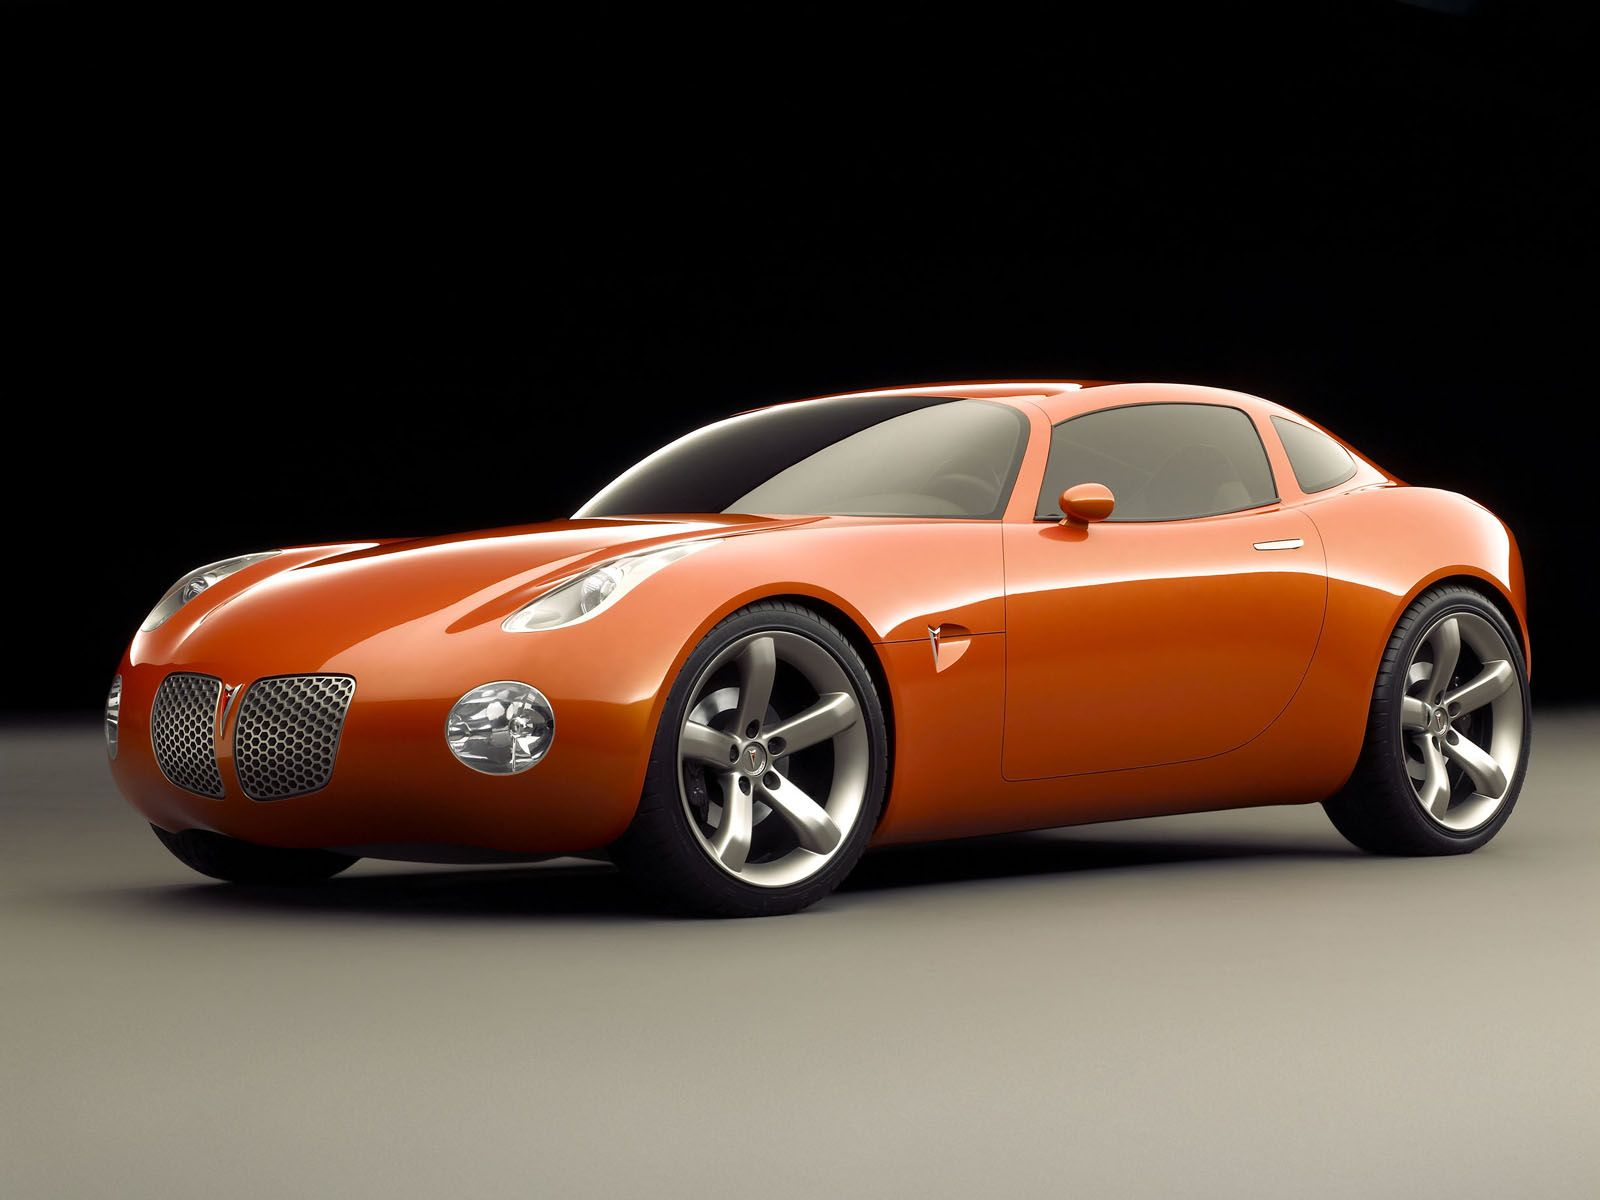 Pontiac Solstice 2005 - 2009 Coupe #3